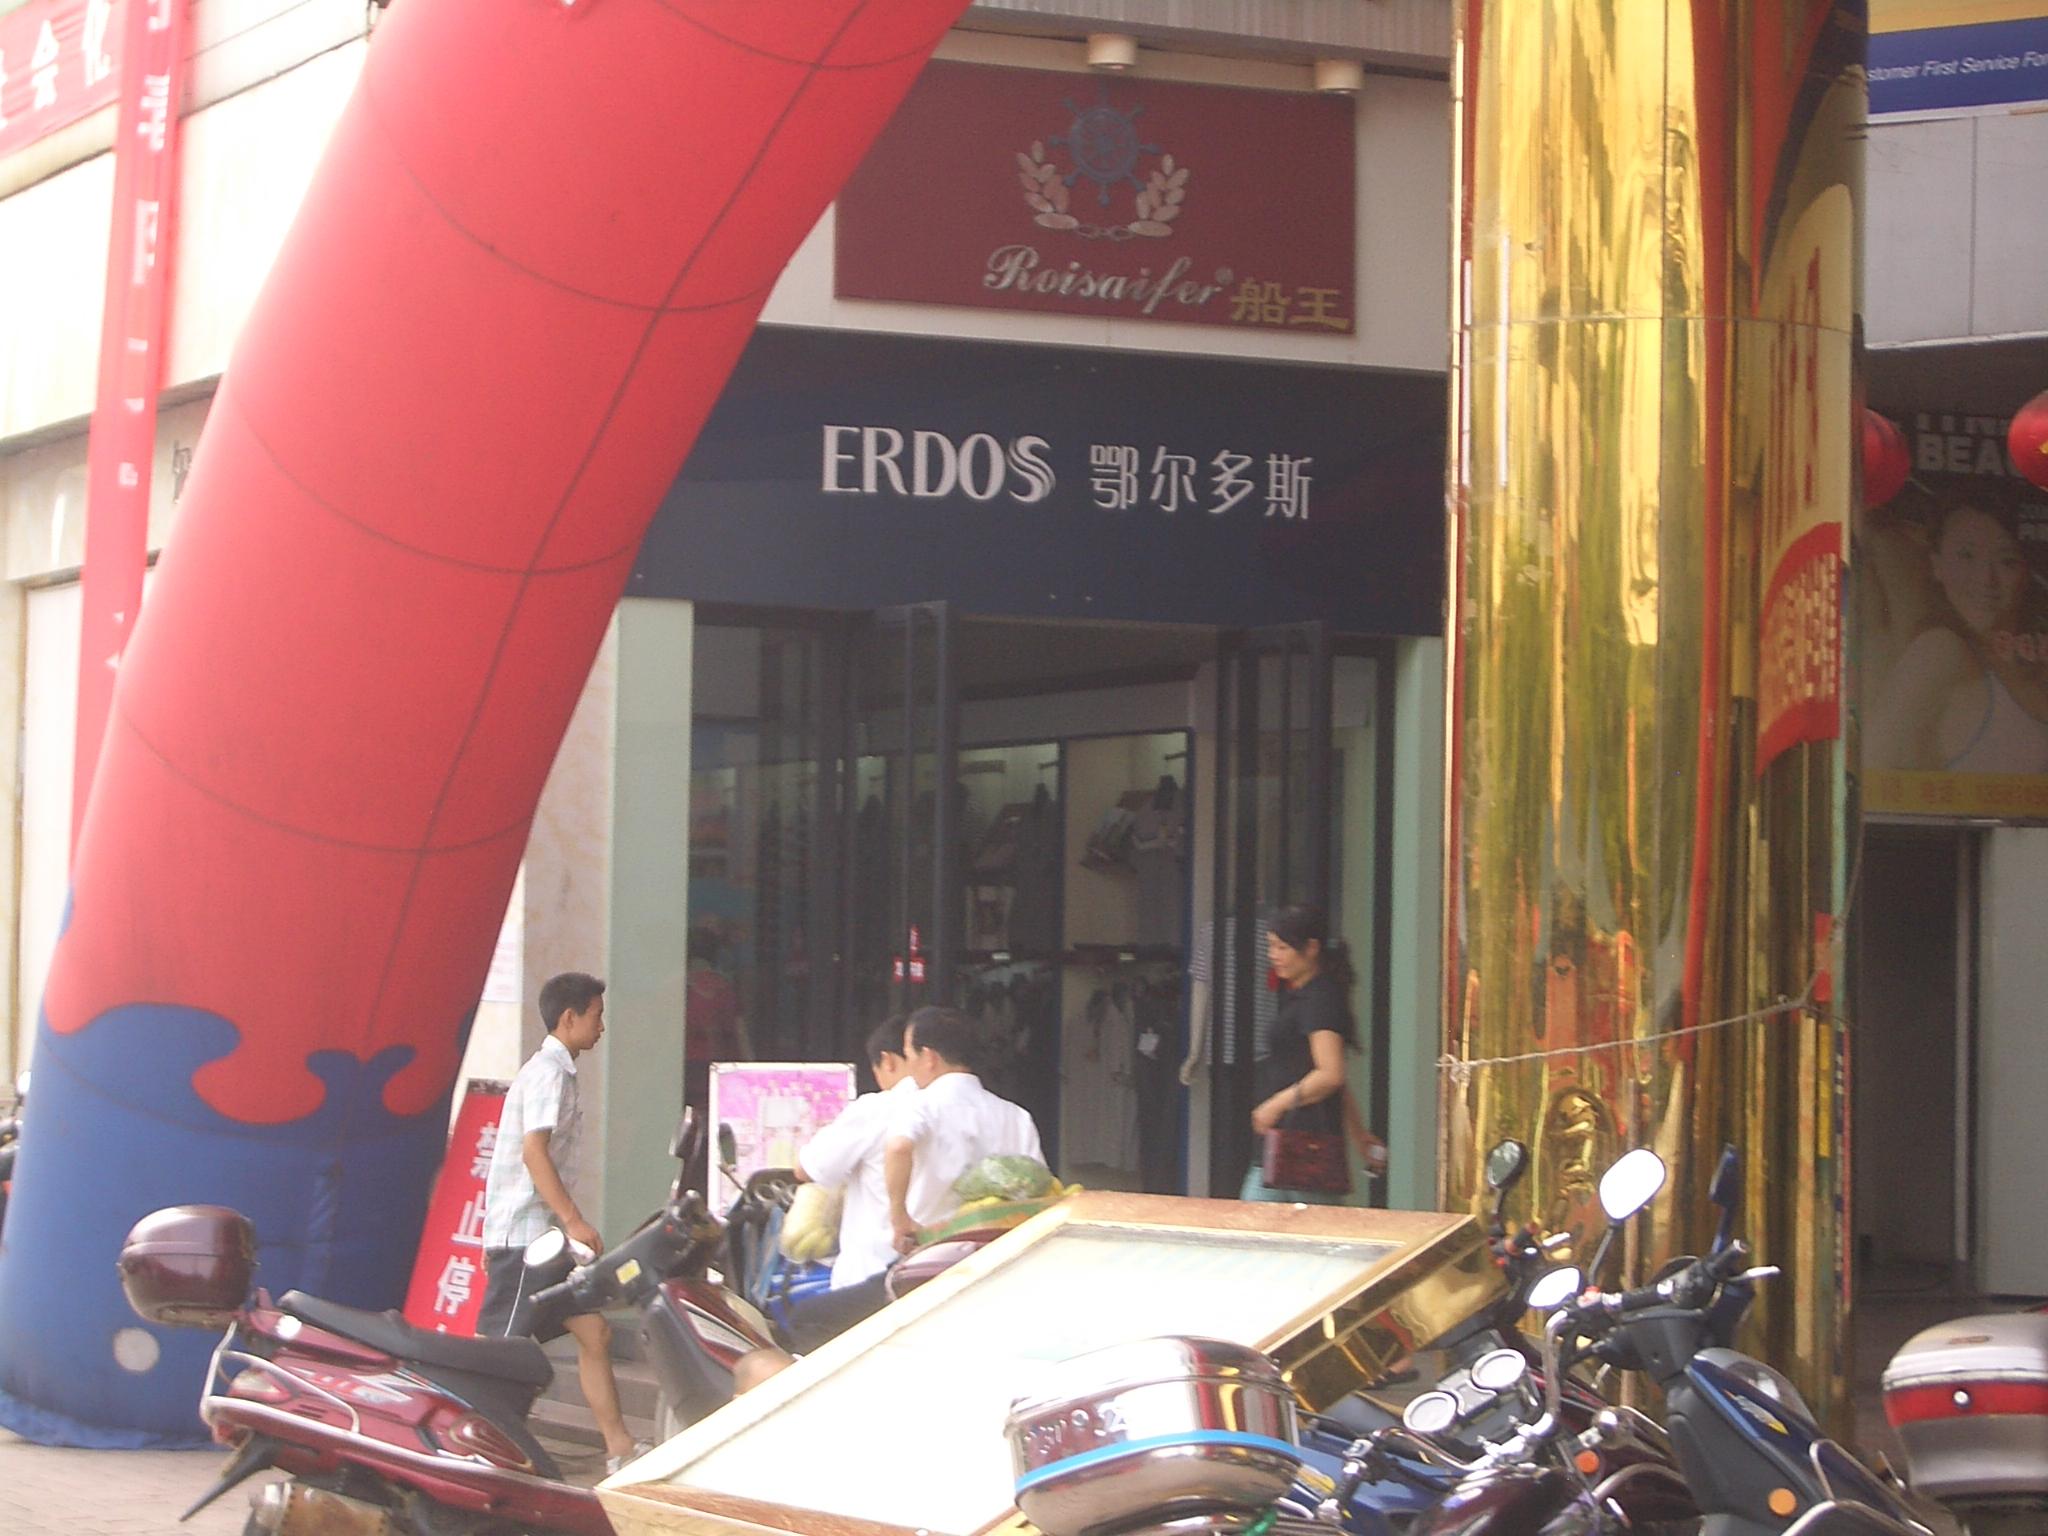 File:Maoping-Zhen-downtown-shopping-mall-entrance-4928.